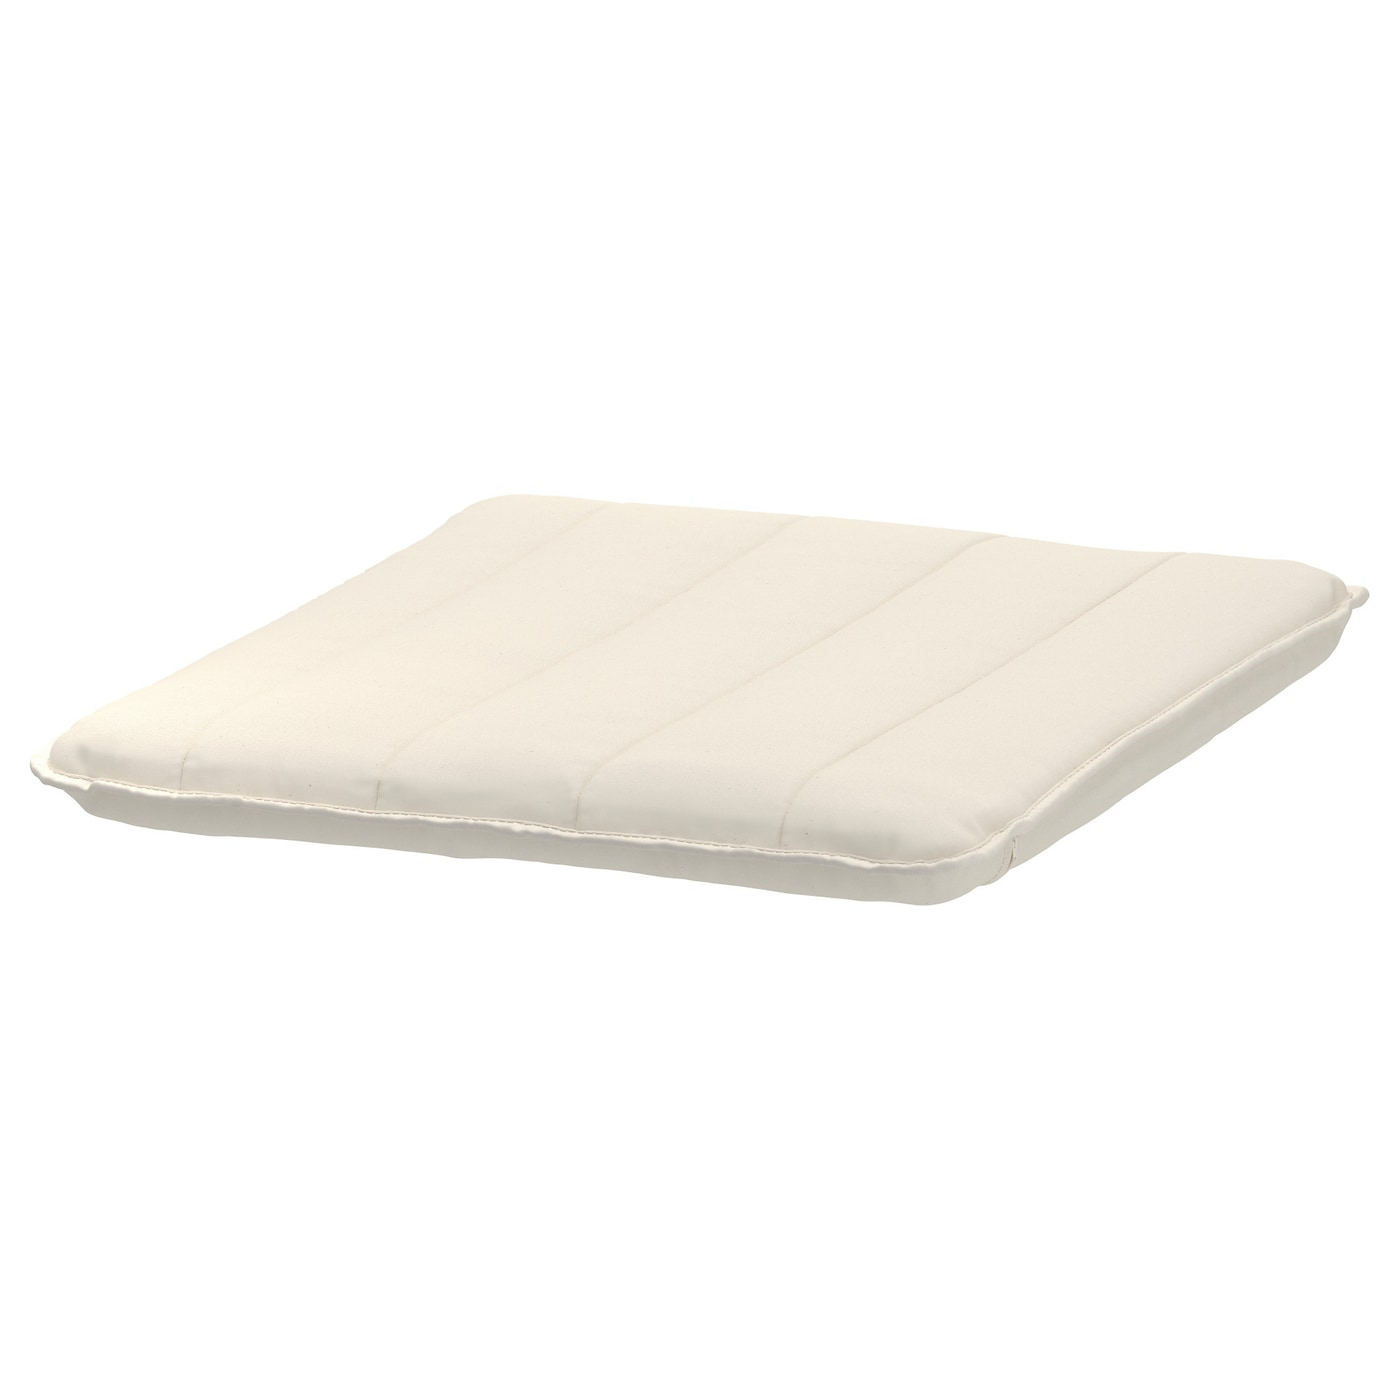 Uncategorized Poang Footstool footstool cushion ransta natural ikea cushion